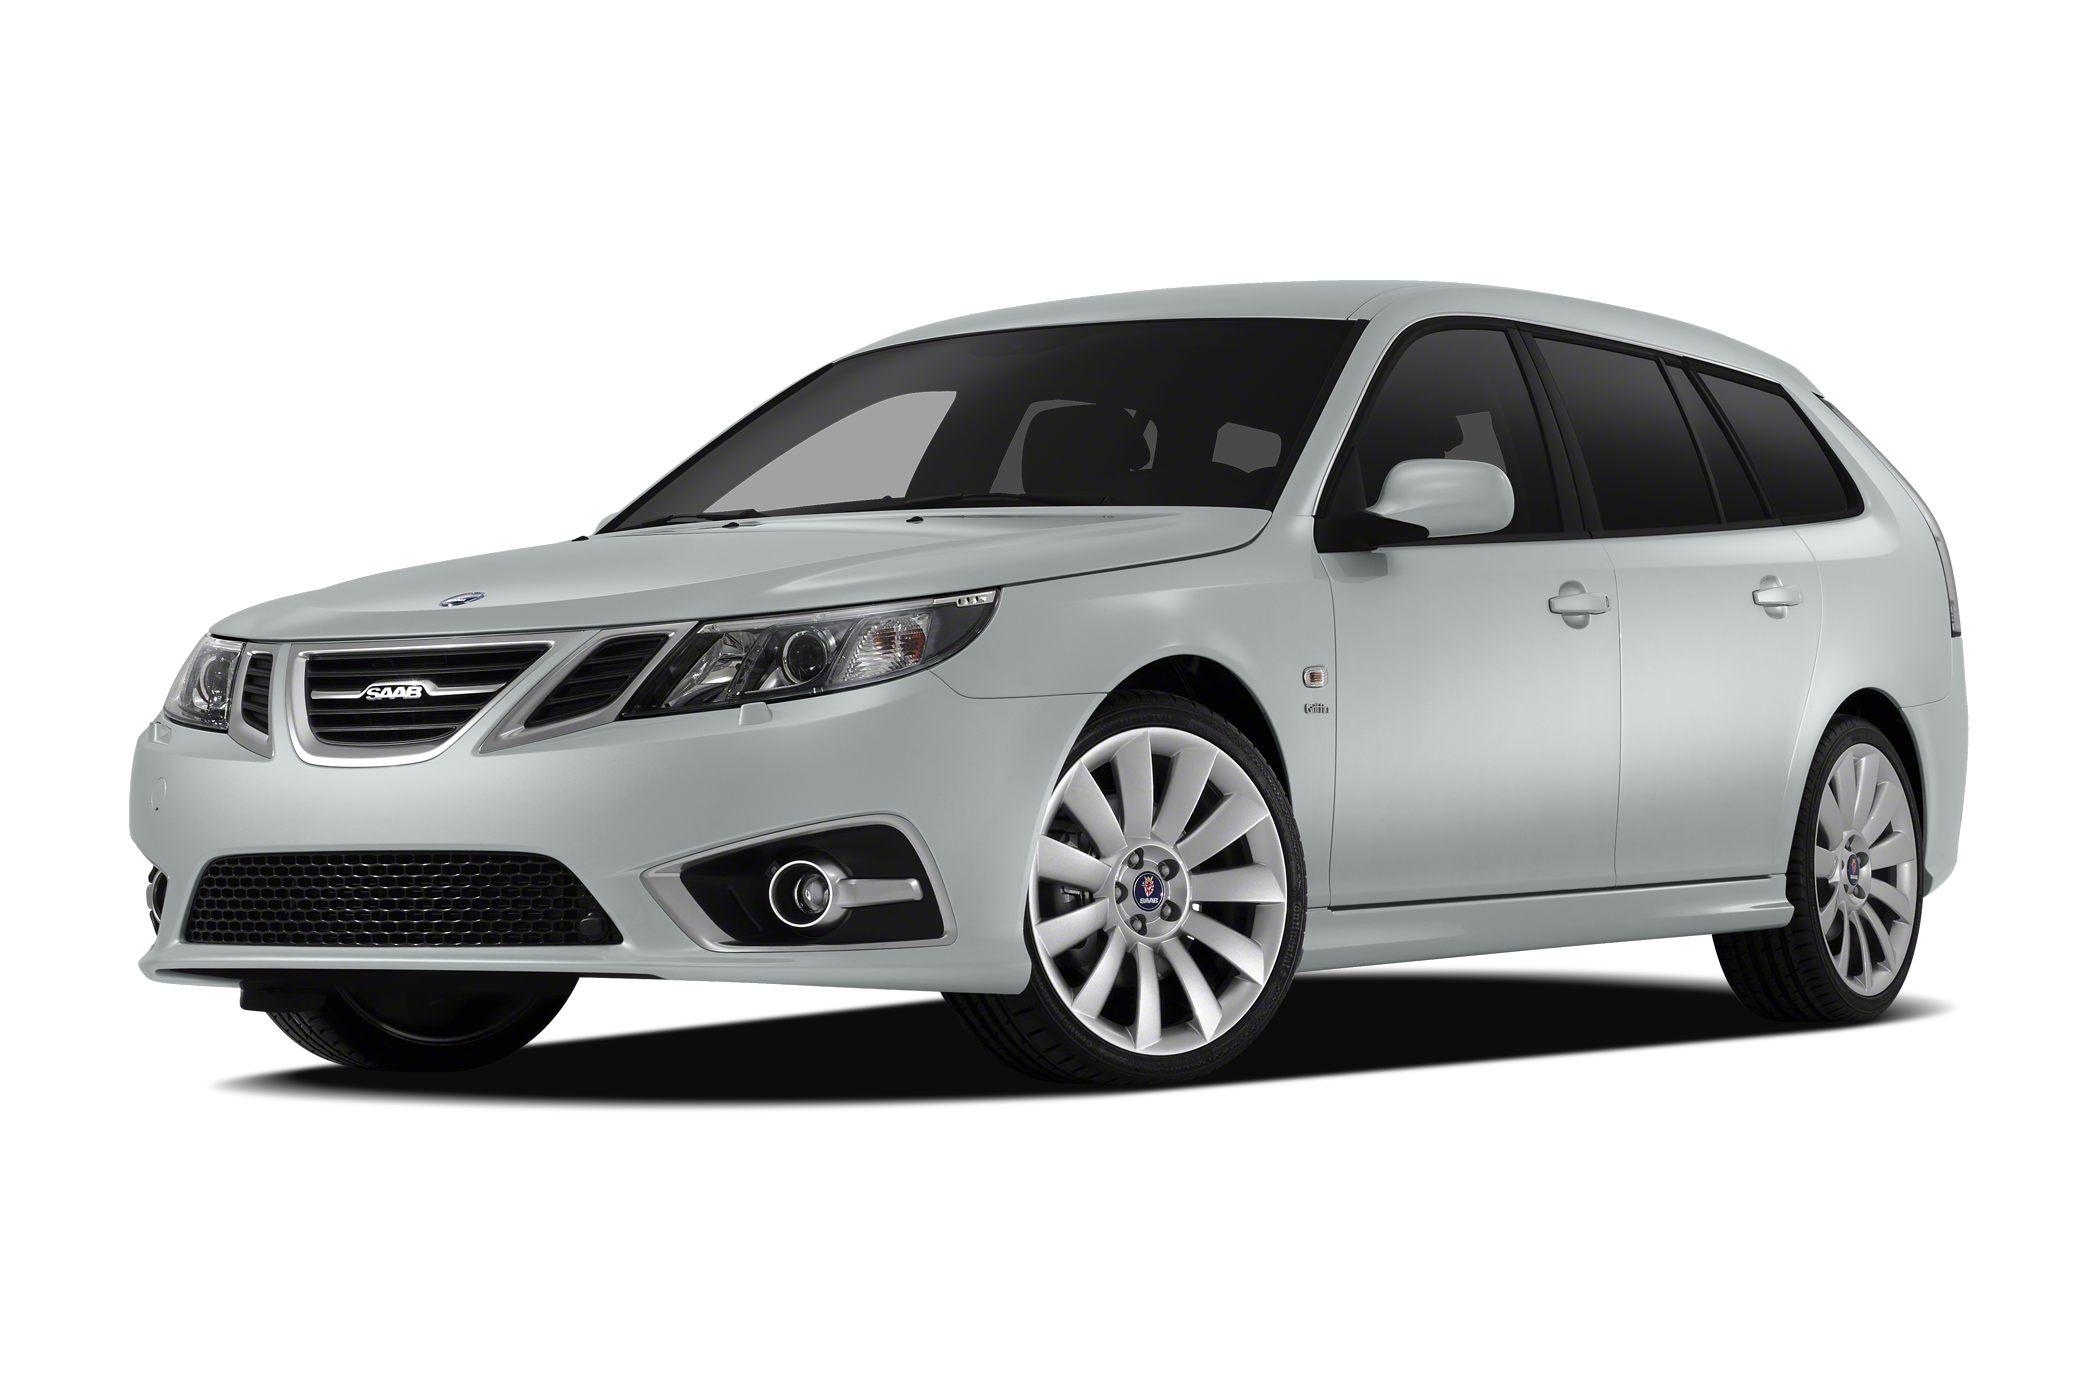 5dr wagon vs 2012 saab 9 3 turbo4 4dr front wheel drive. Black Bedroom Furniture Sets. Home Design Ideas